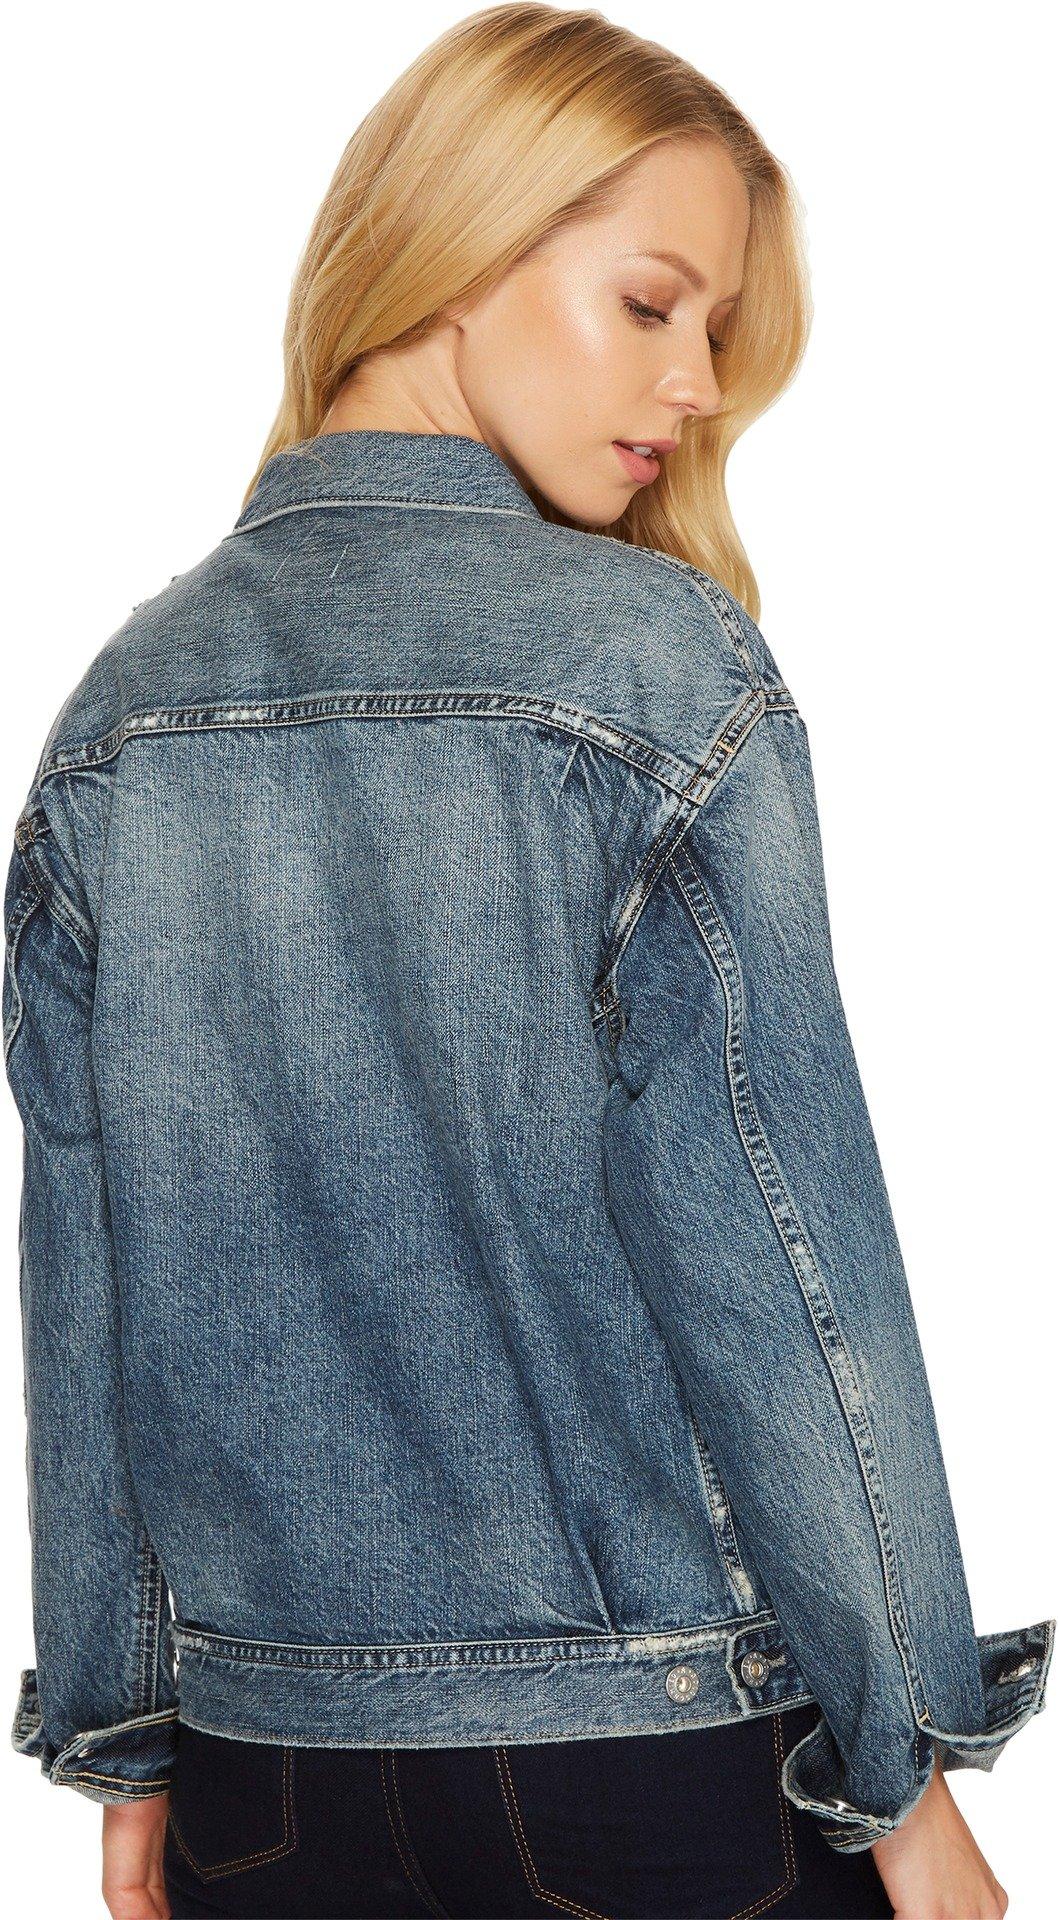 AG Adriano Goldschmied AG Women's Cassie Denim Jacket, 14 Years Nostalgia, Medium